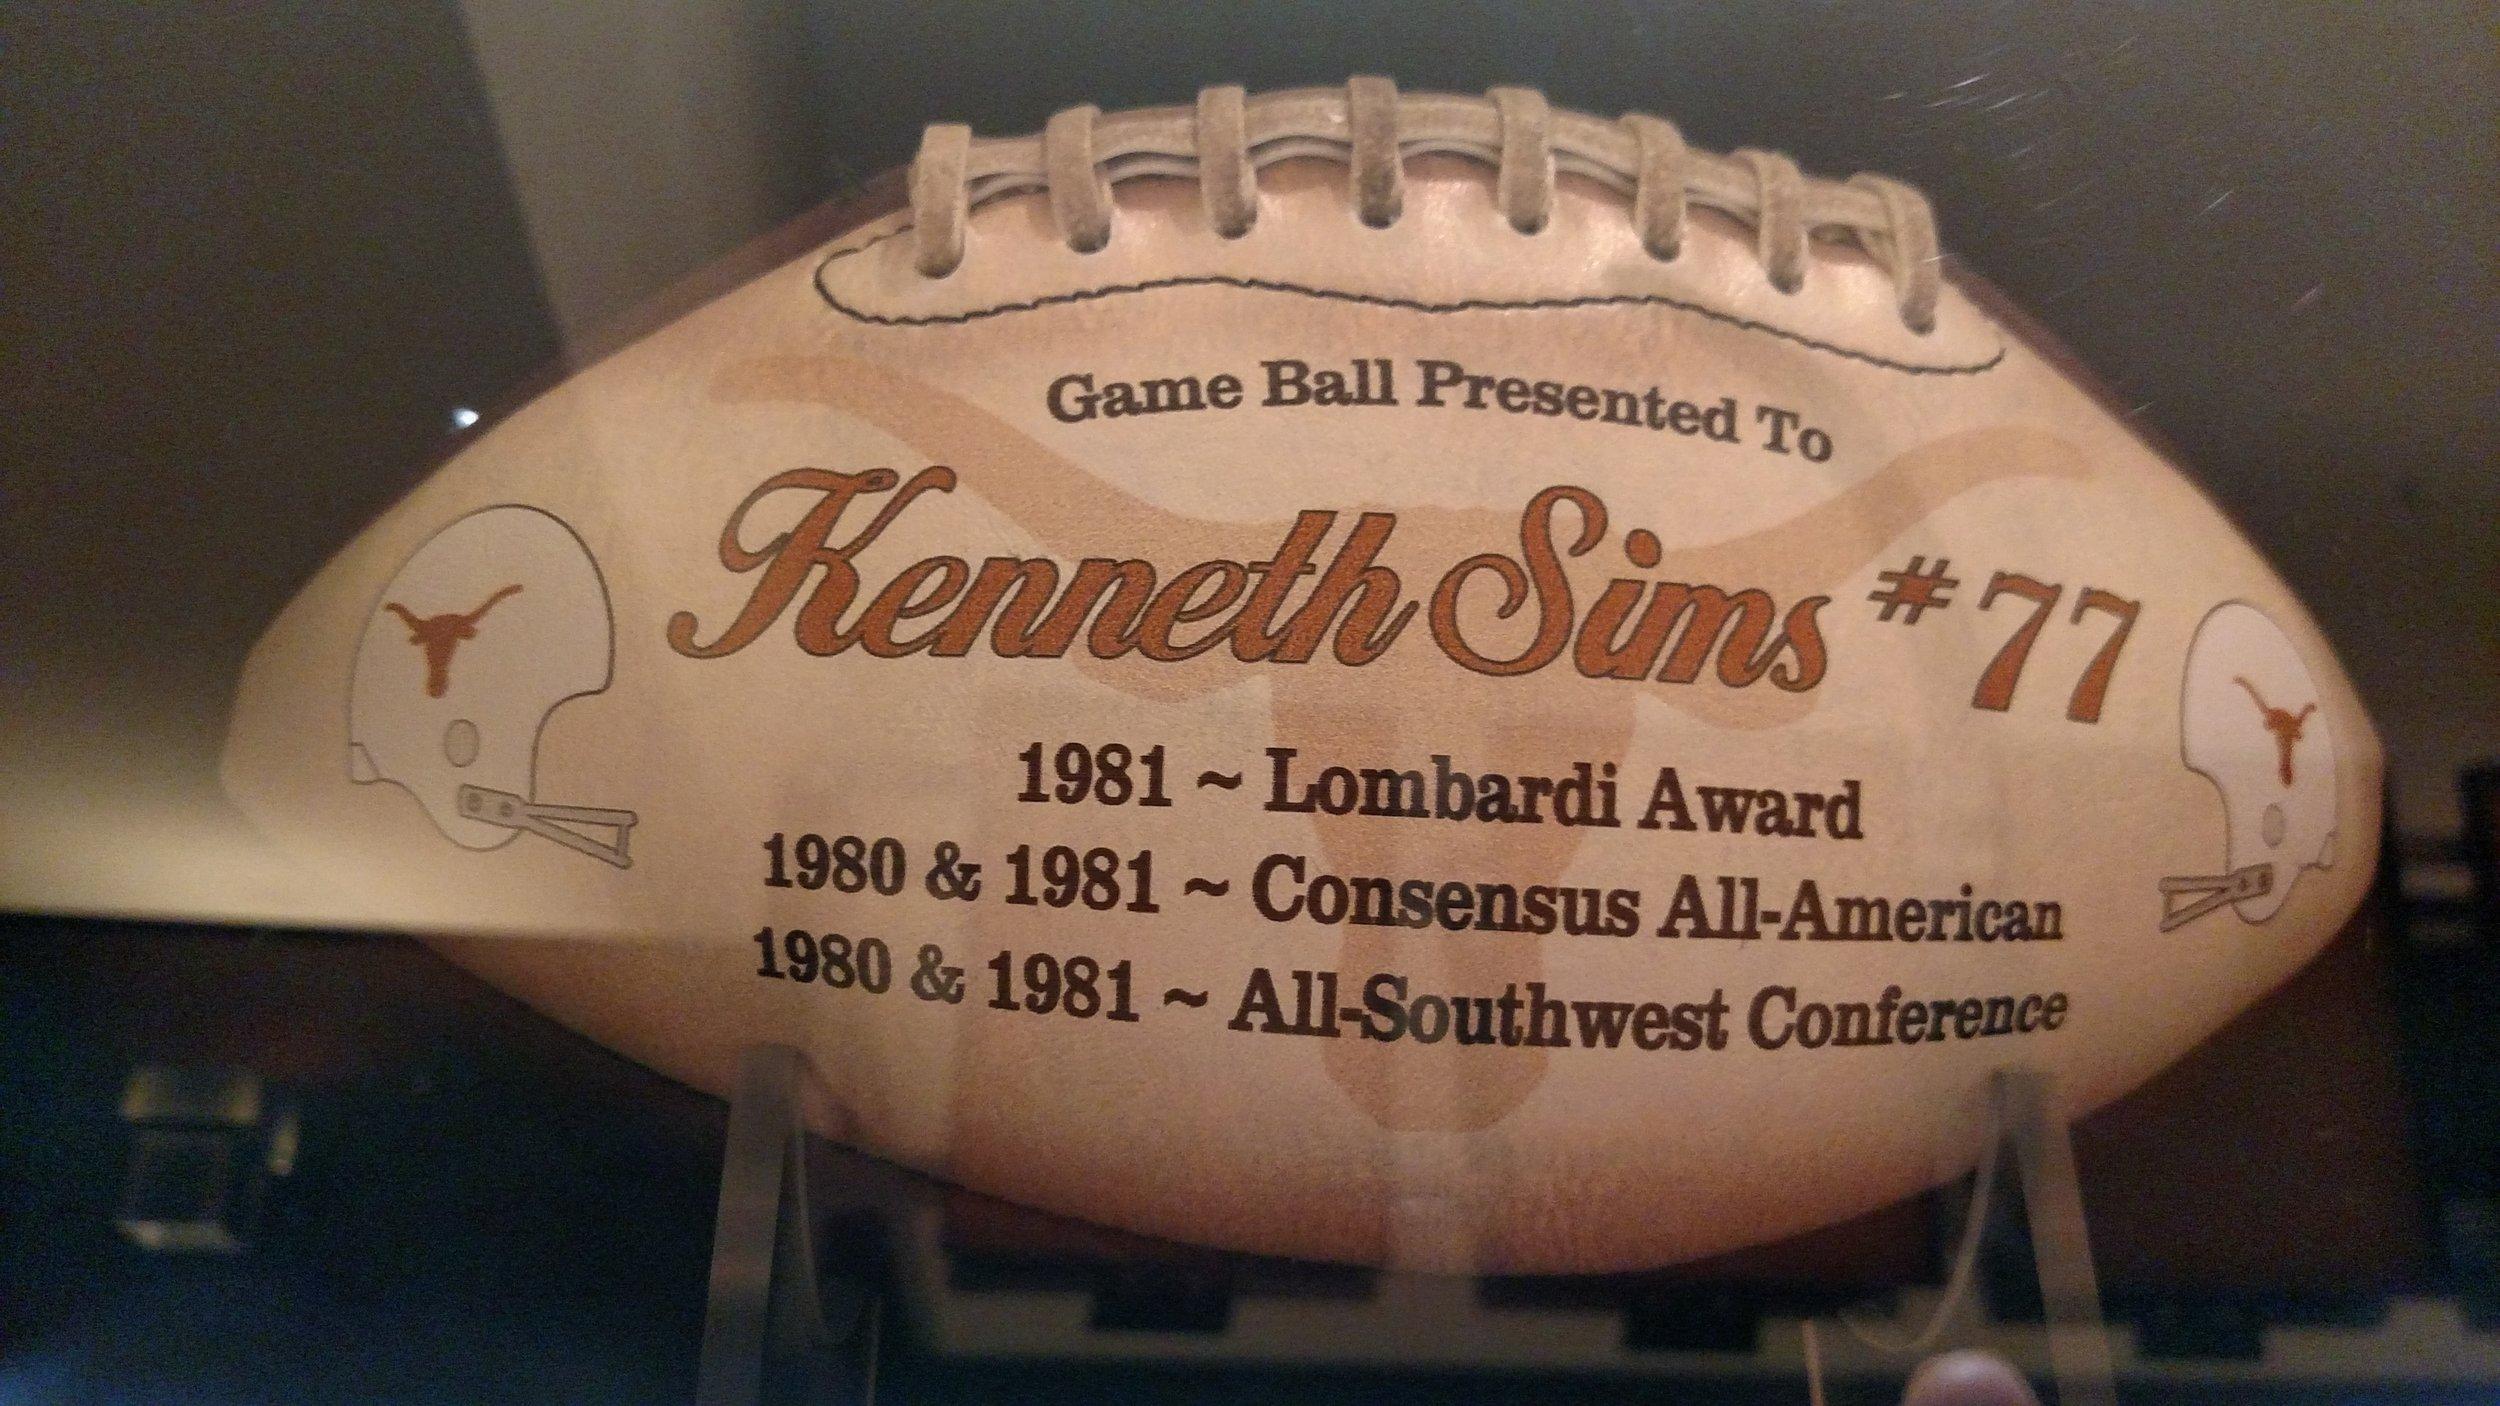 Kenneth Sims